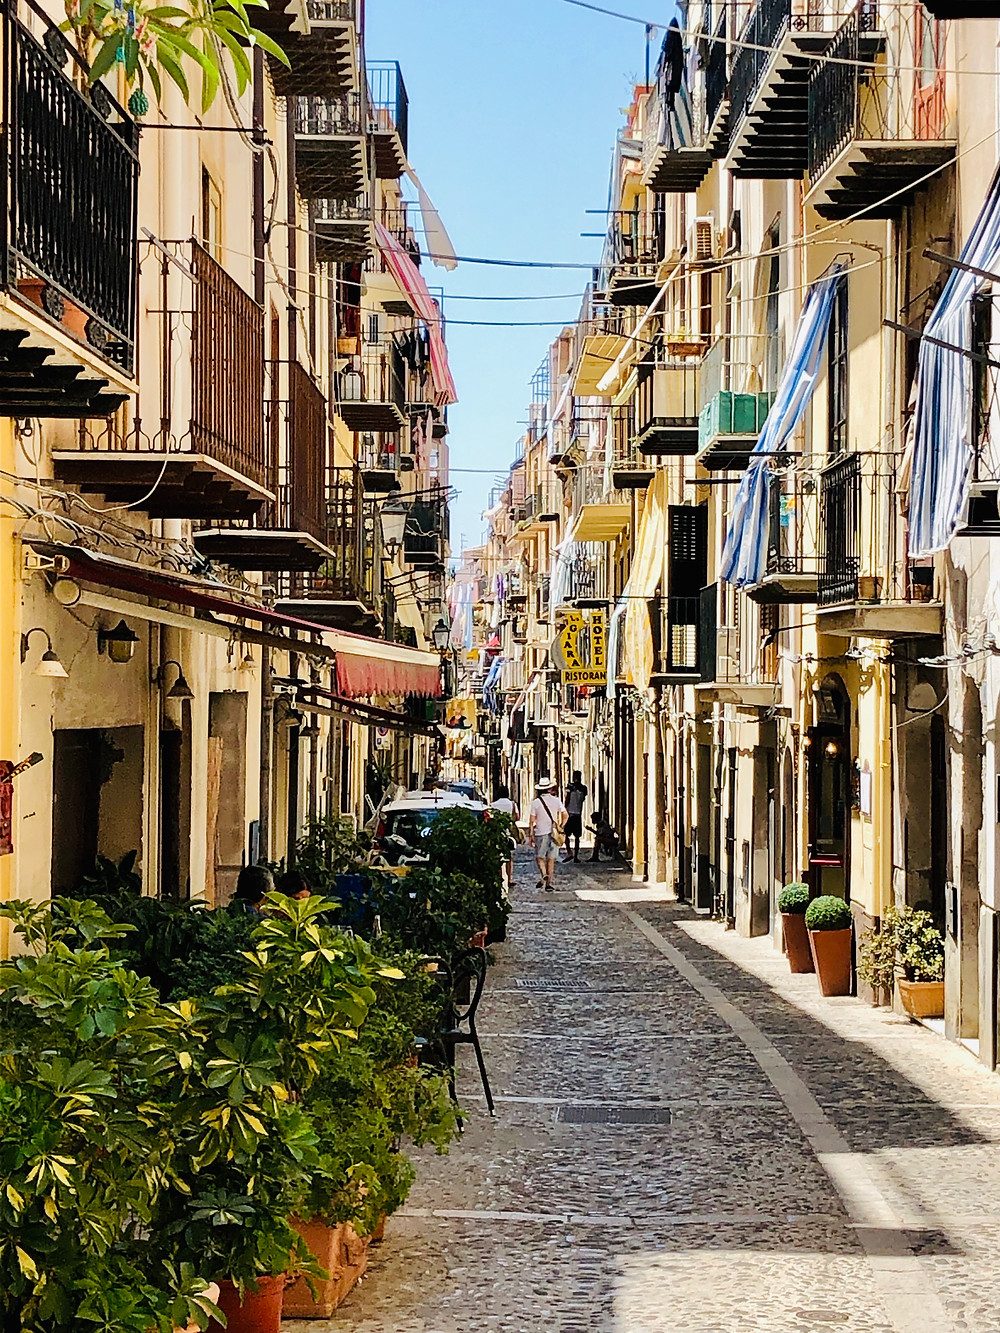 Charming Italian street in Cefalu Sicily